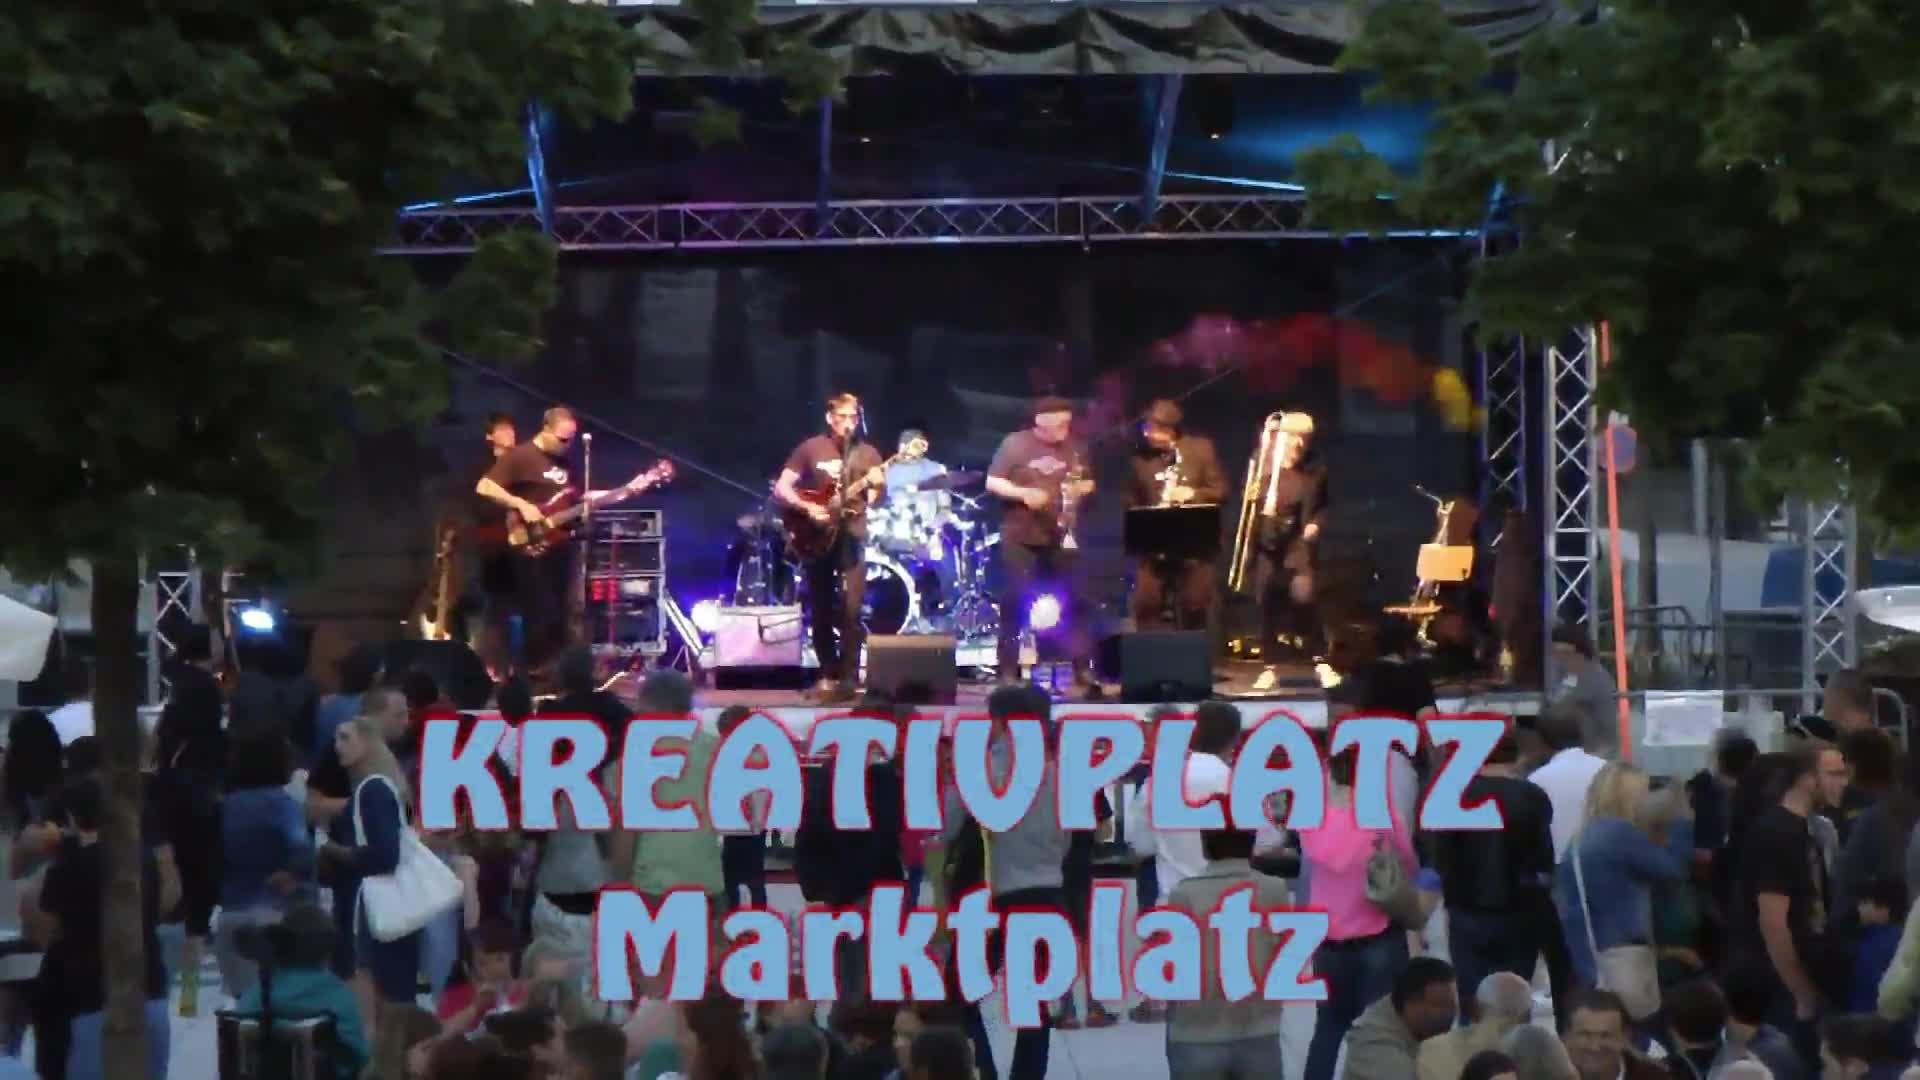 KreativPlatz - MarktPlatz